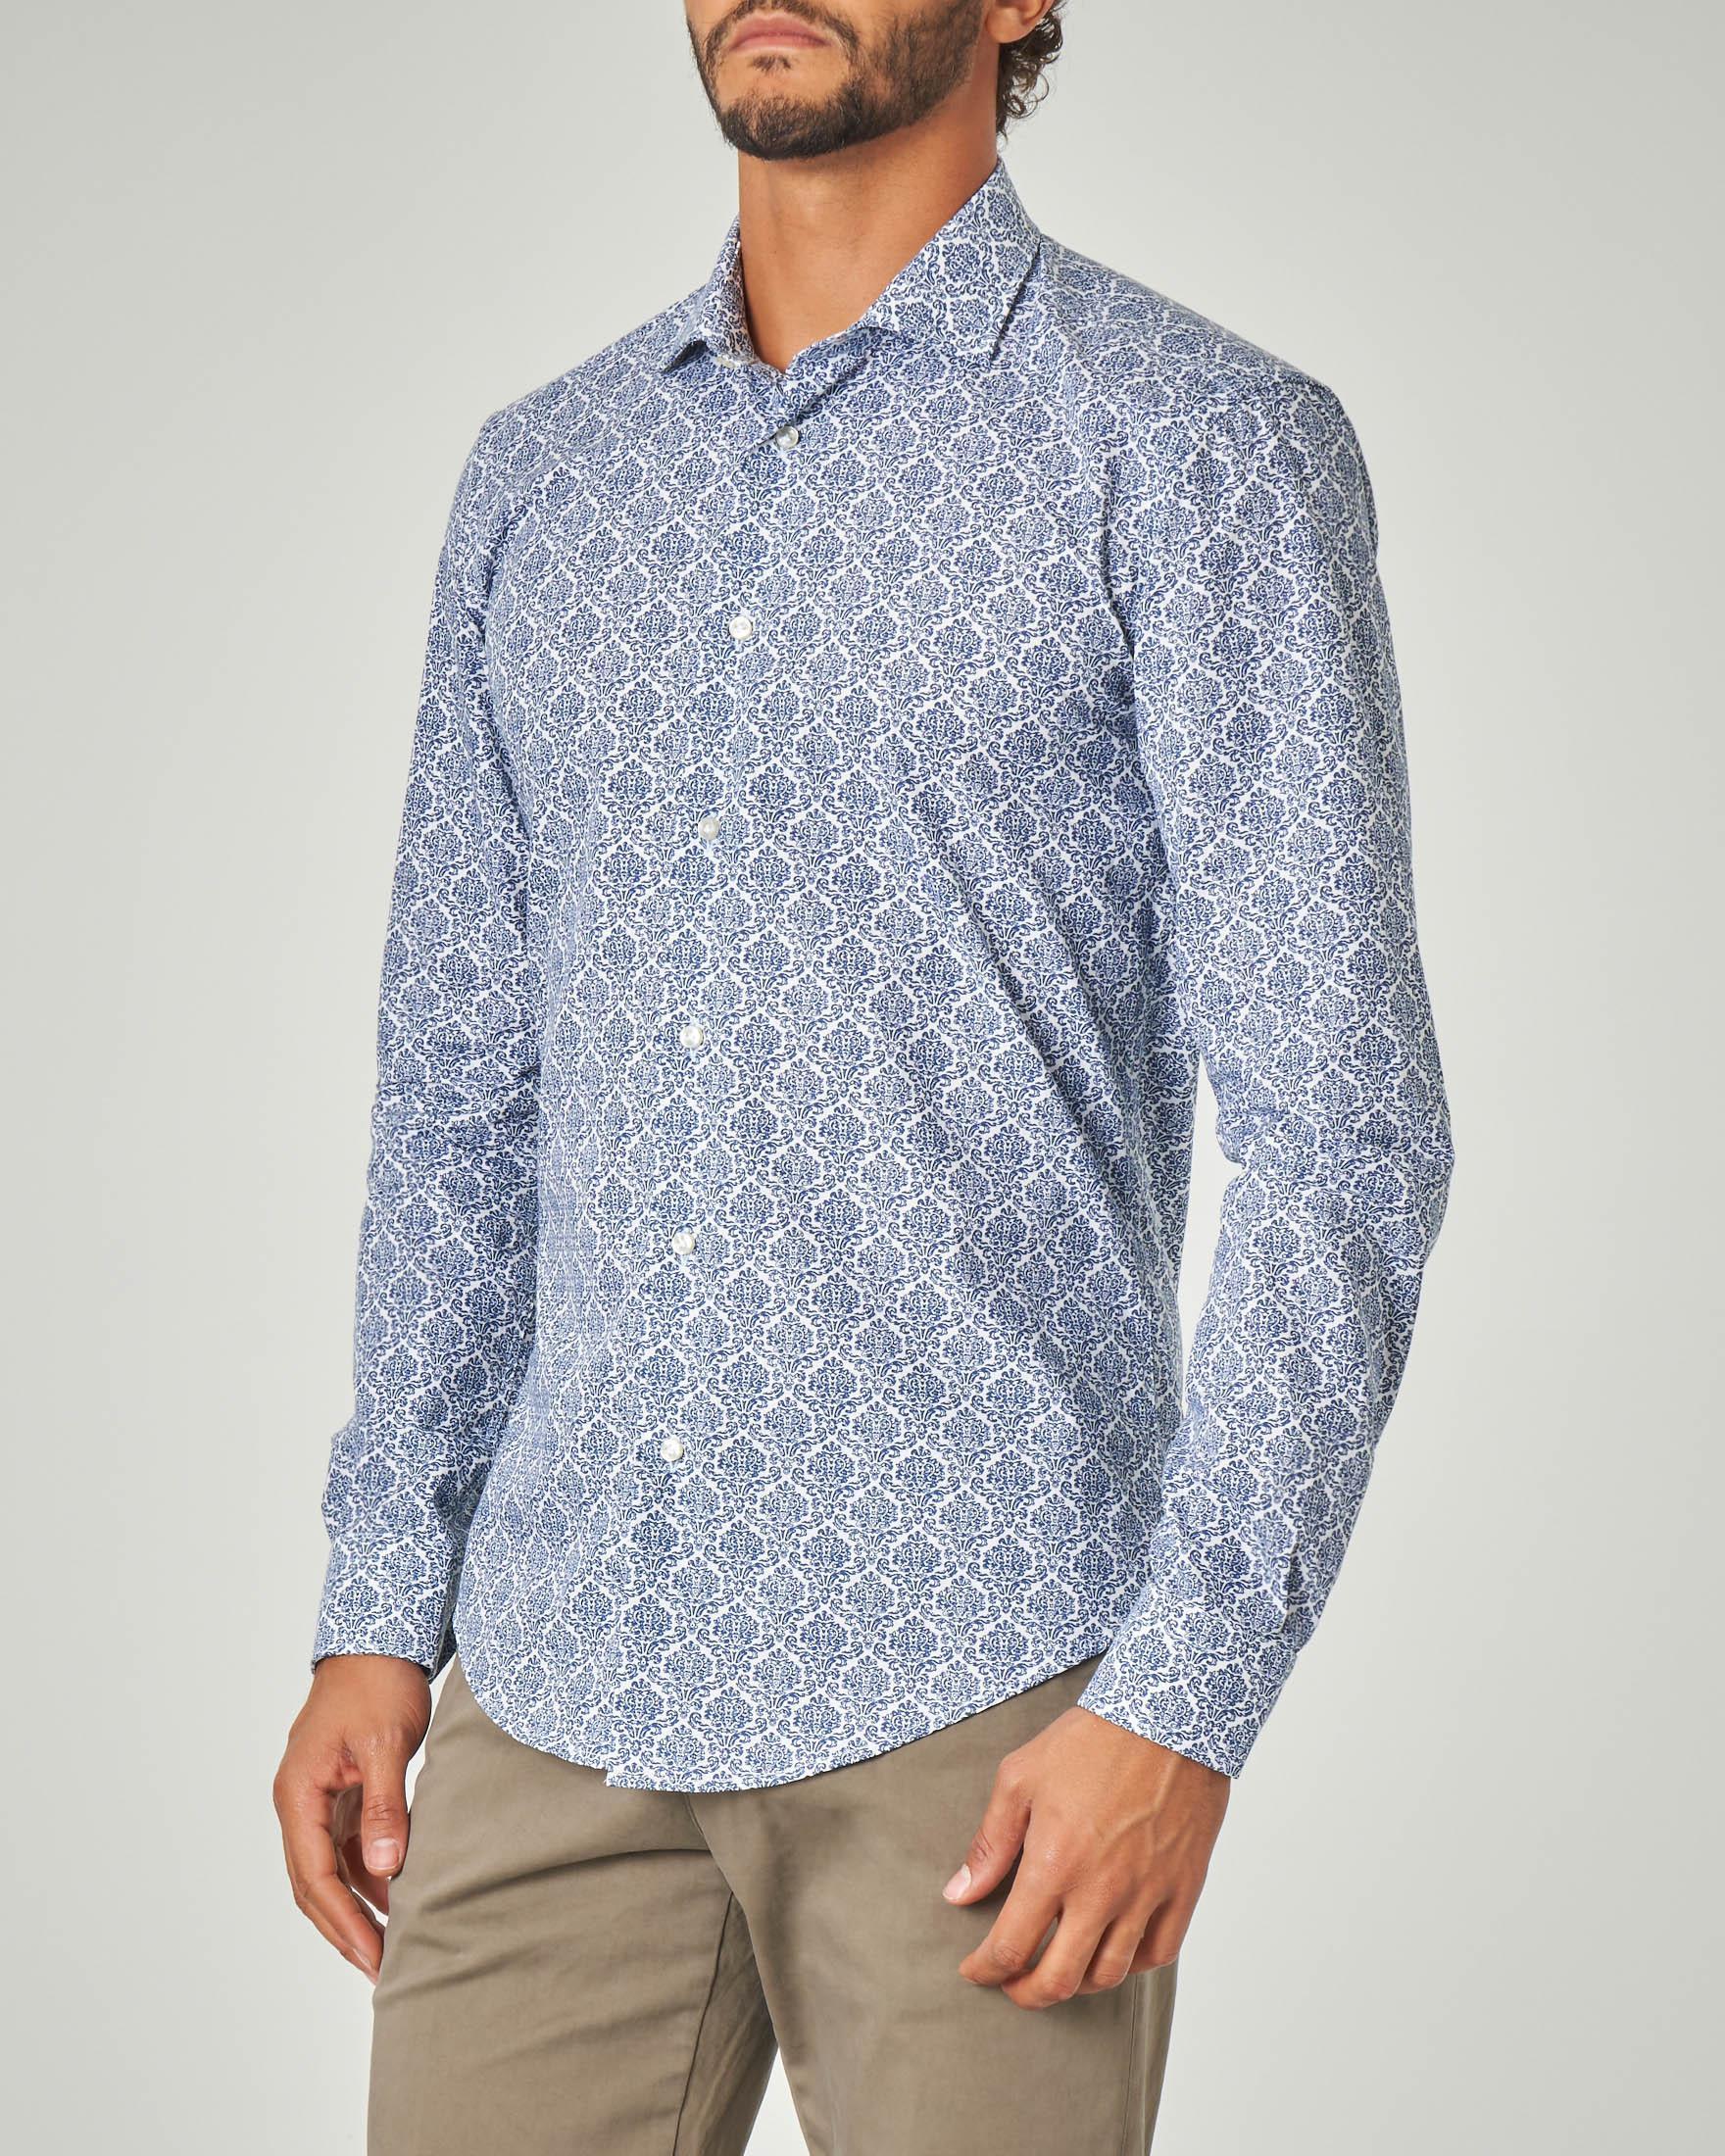 Camicia blu in fantasia stampata